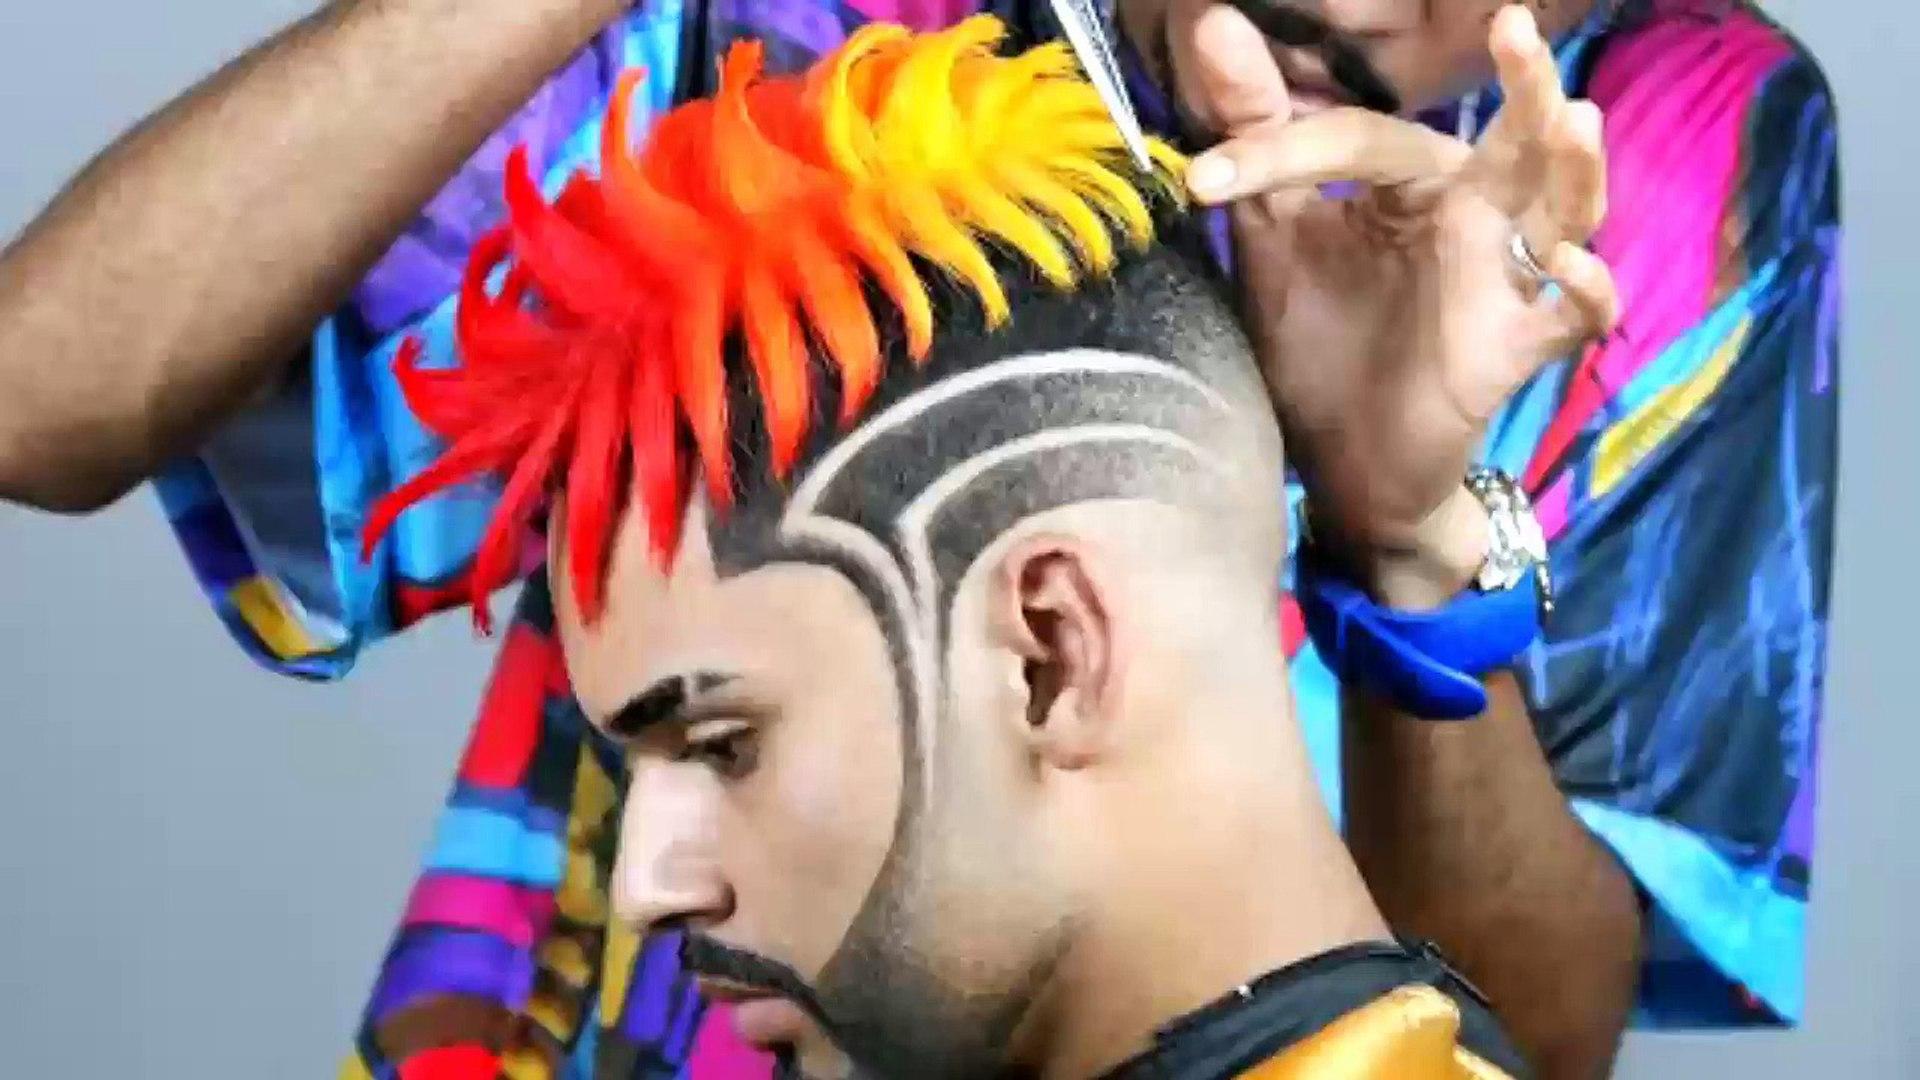 Amazing hair style  Hair transformation ✂️   free style। Awesome hair style। nice hair style। new ha